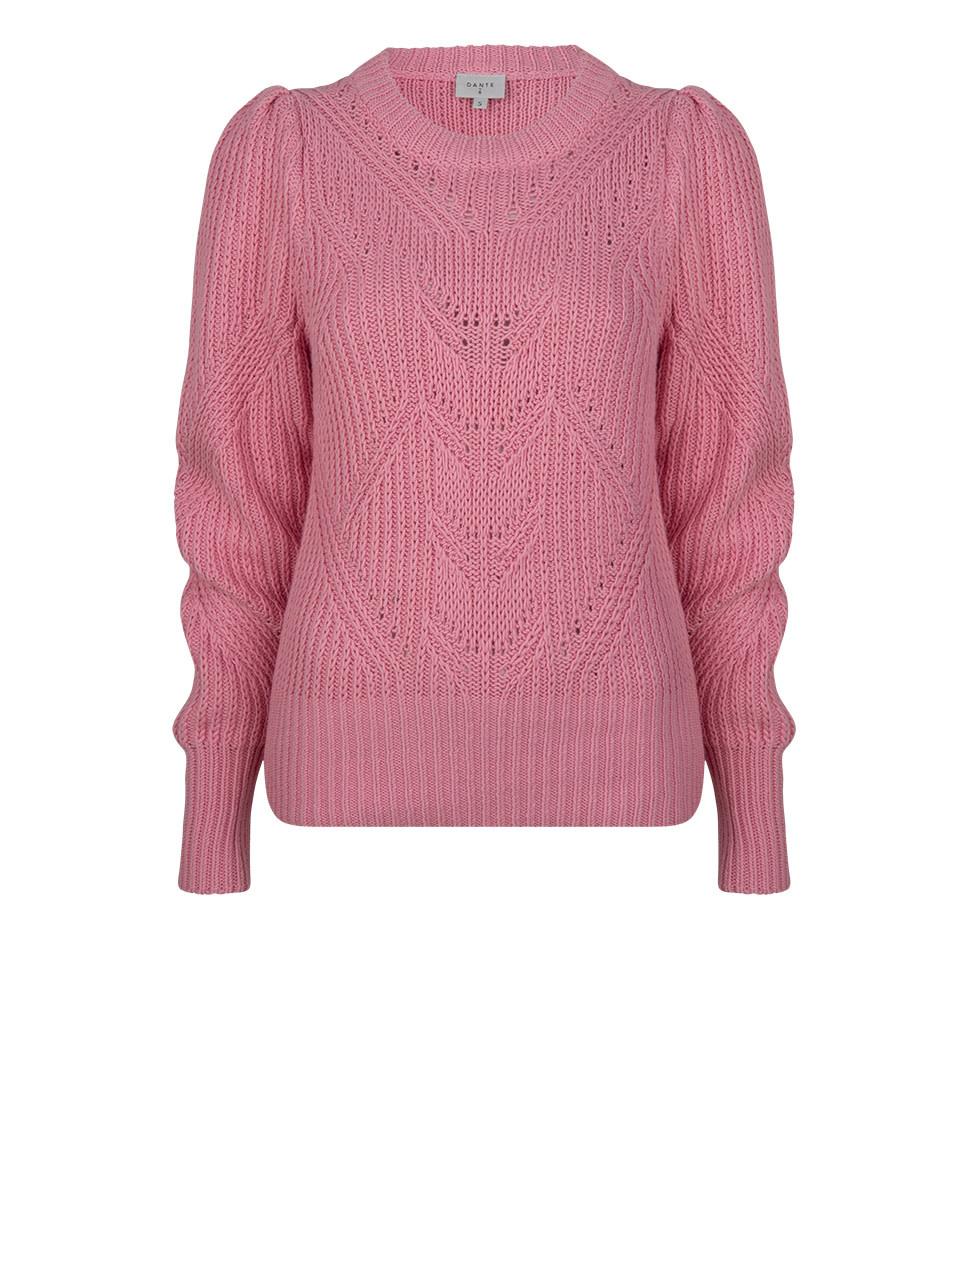 Cleo sweater fresh pink-1